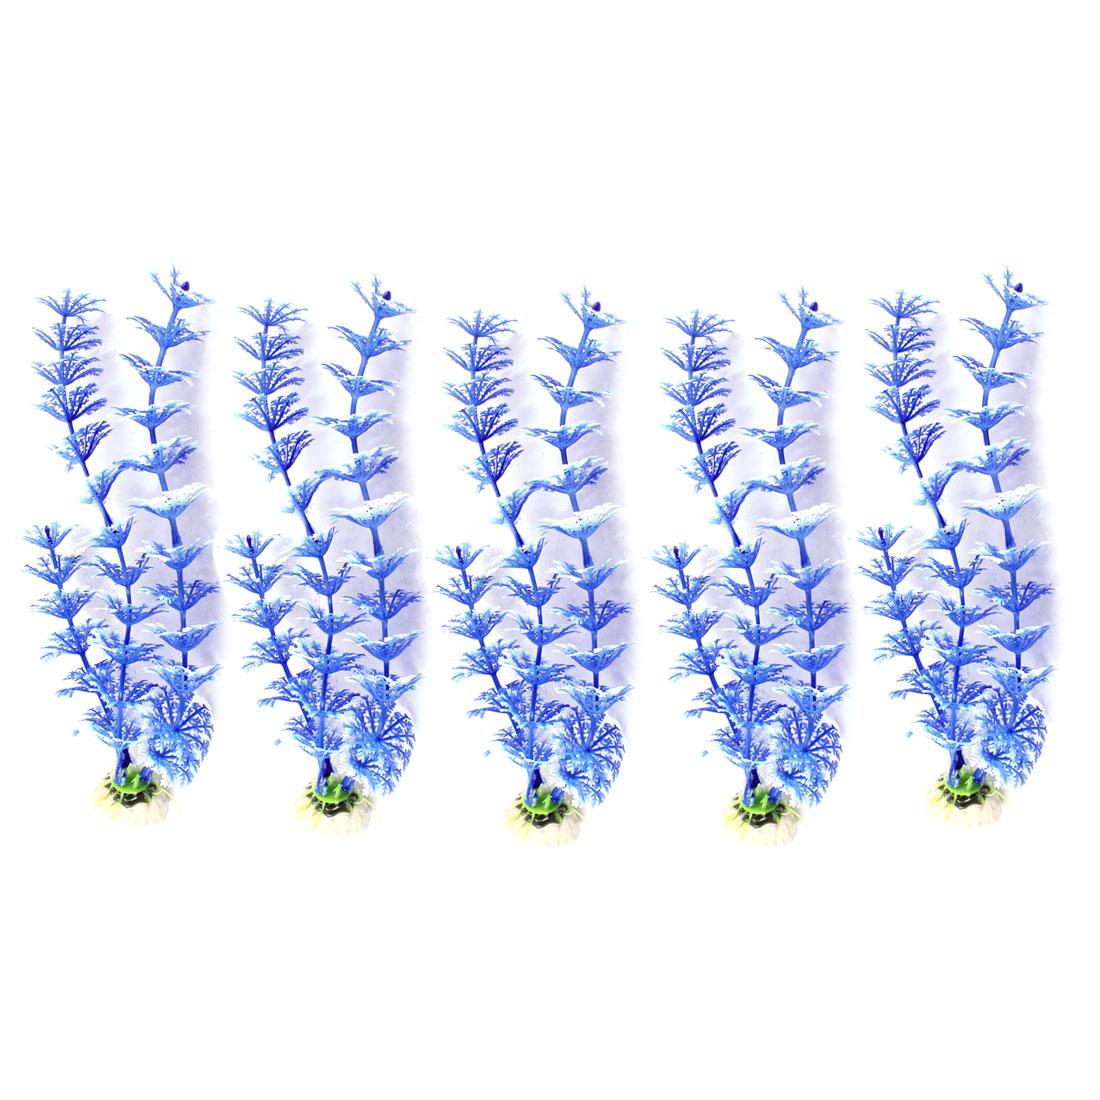 "5 Pcs Aquarium Ornament Snowflake Grass Plant Blue White 8.7"" High"